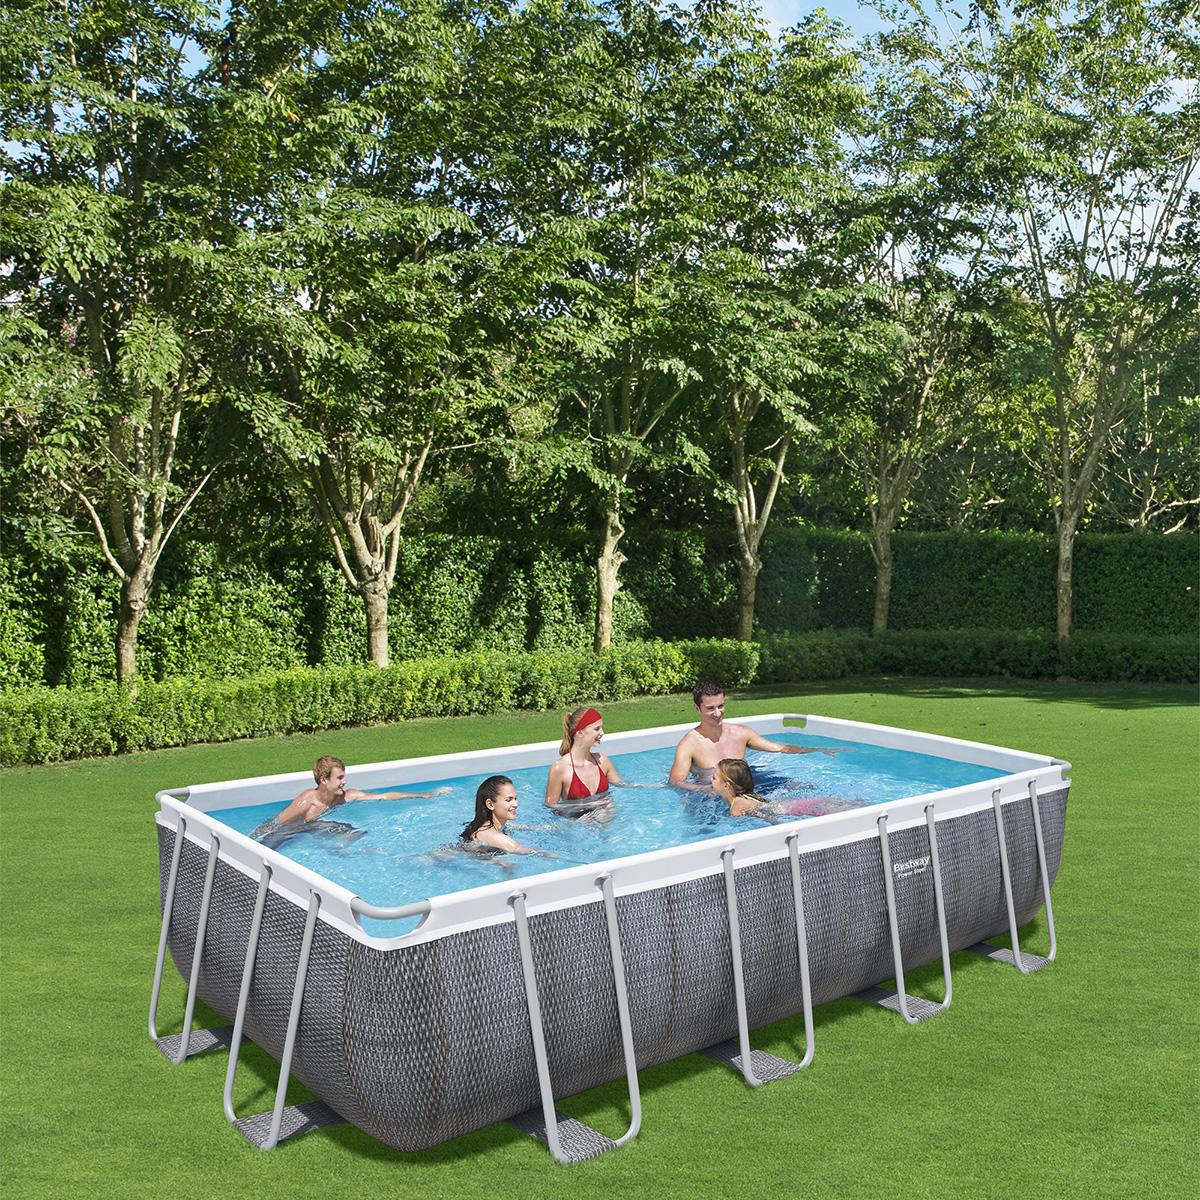 piscine tubulaire rectangulaire power steel 5,49 x 2,74 x 1,22m